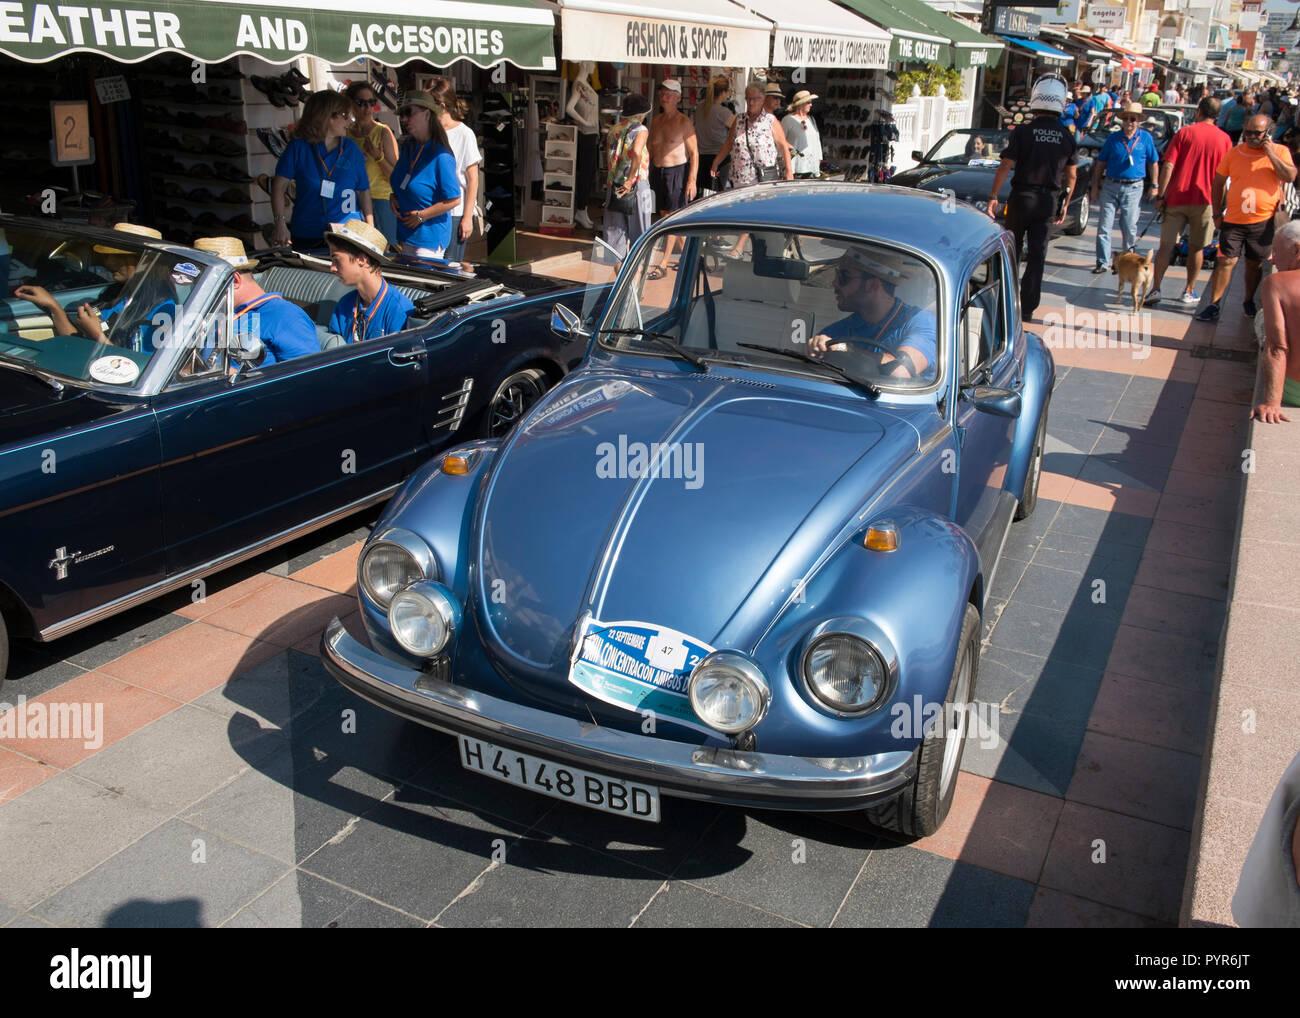 Volkswagen Beetle classique. Classic car réunion à Torremolinos, Malaga, Espagne. Banque D'Images